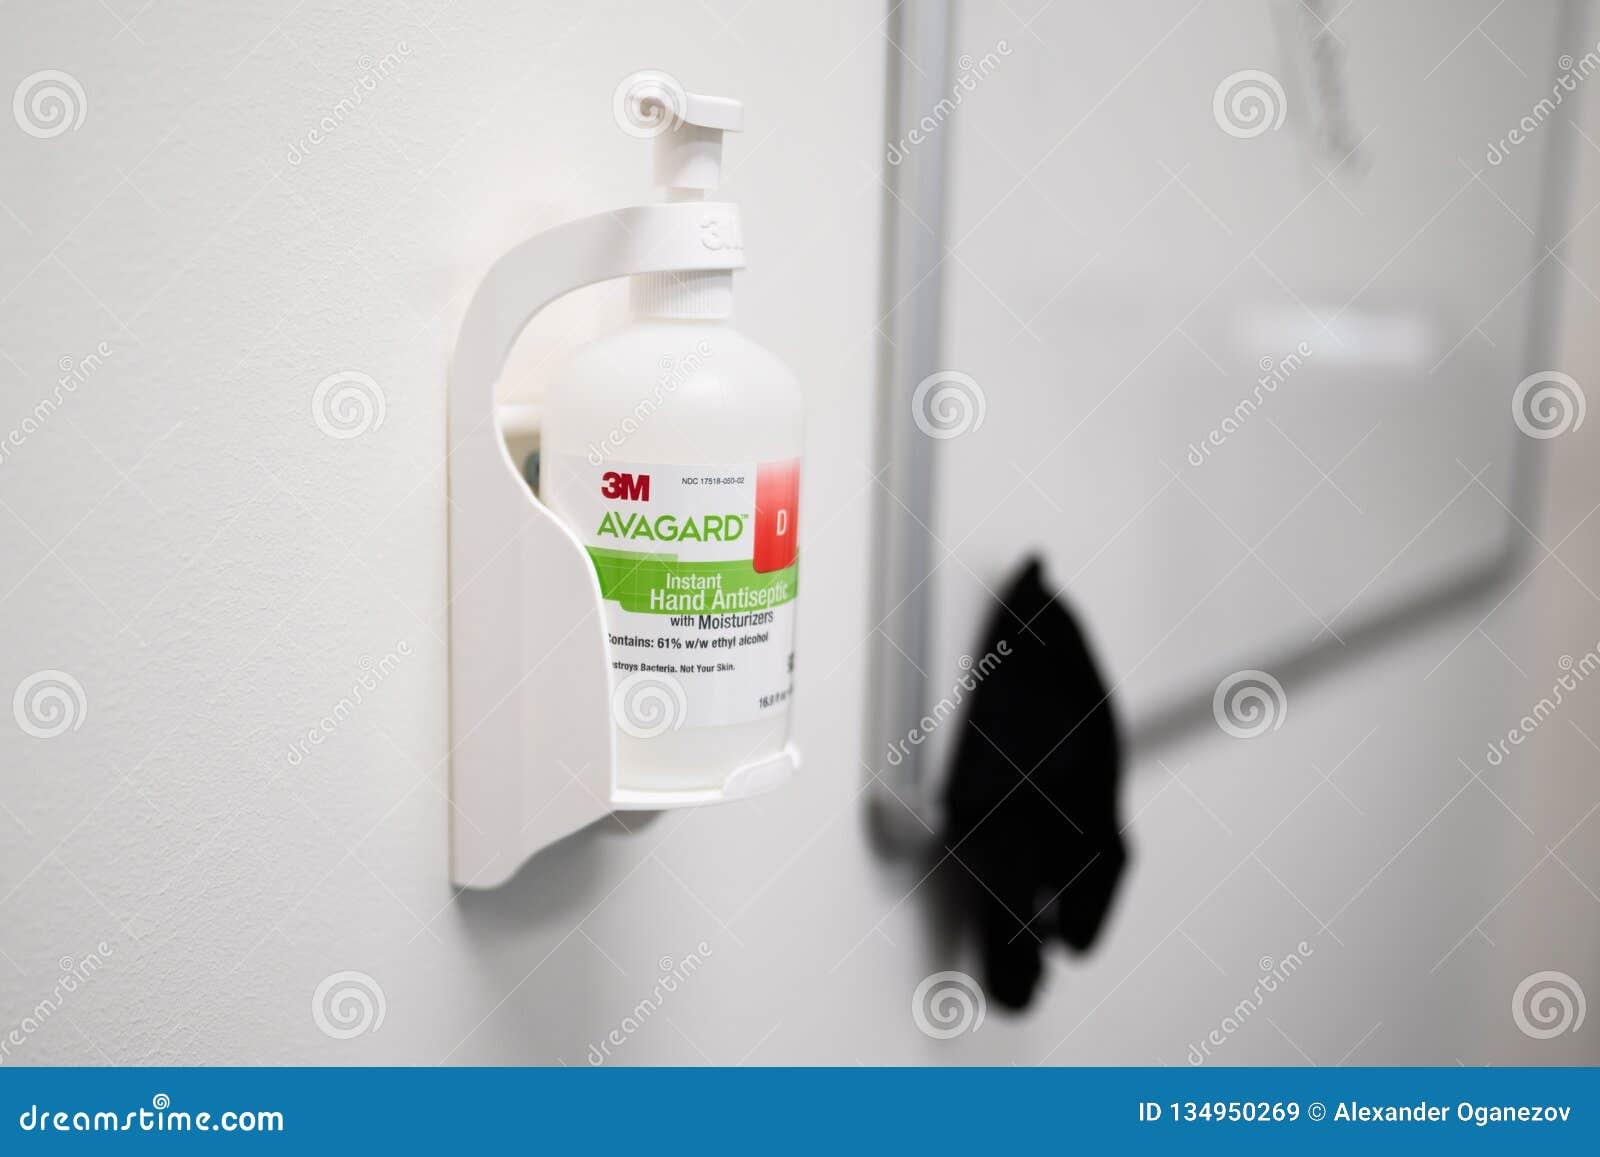 Mountain Falls Advanced Hand Sanitizer With Vitamin E Original